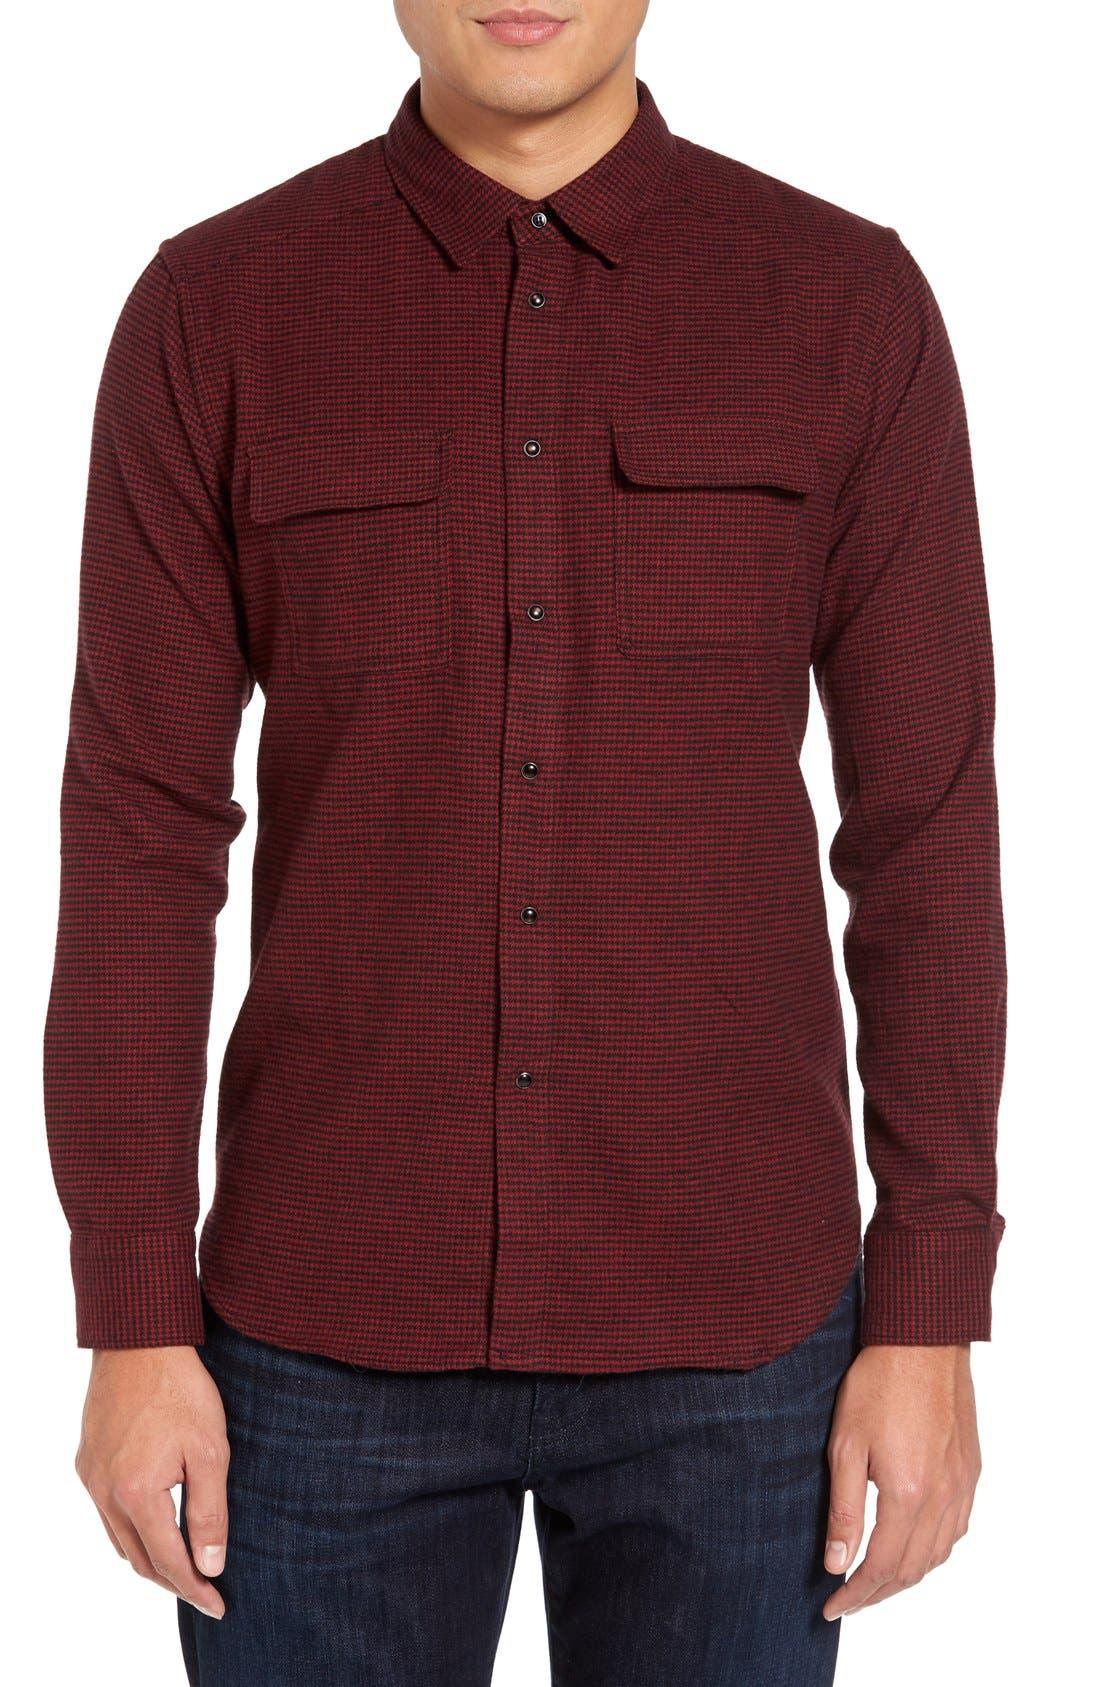 Slate & Stone Parker Slim Fit Houndstooth Flannel Shirt